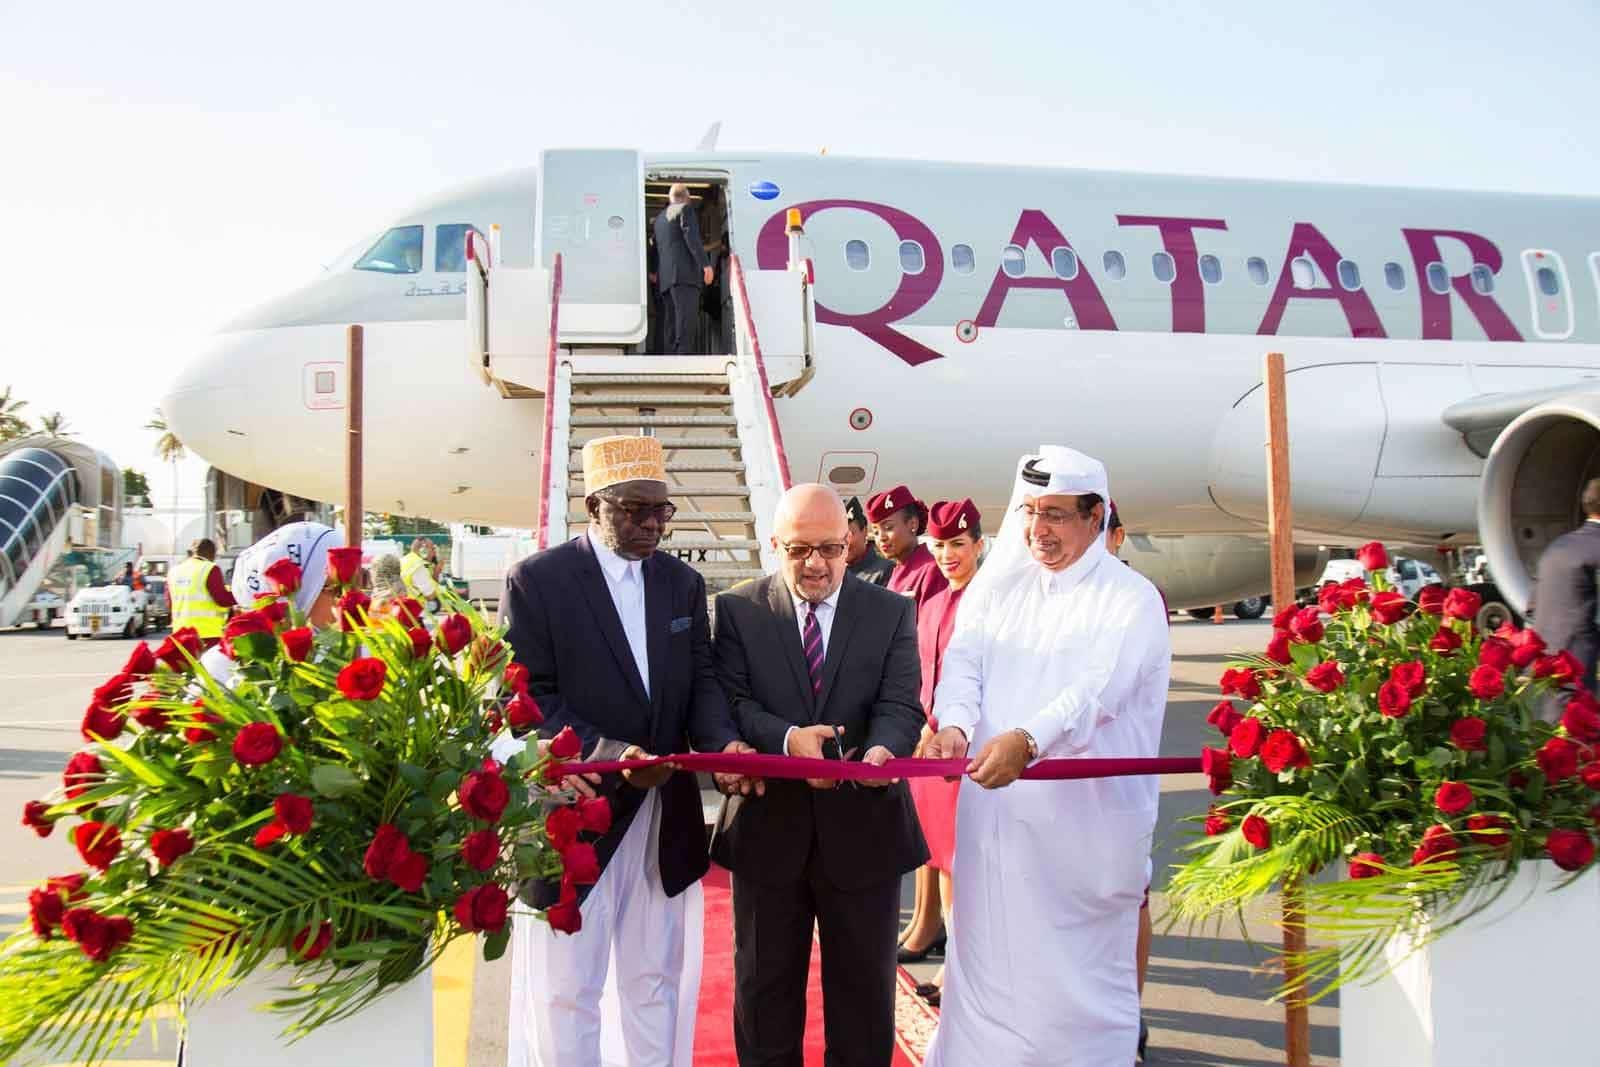 Qatar Airways ribbon cutting ceremony at Zanzibar